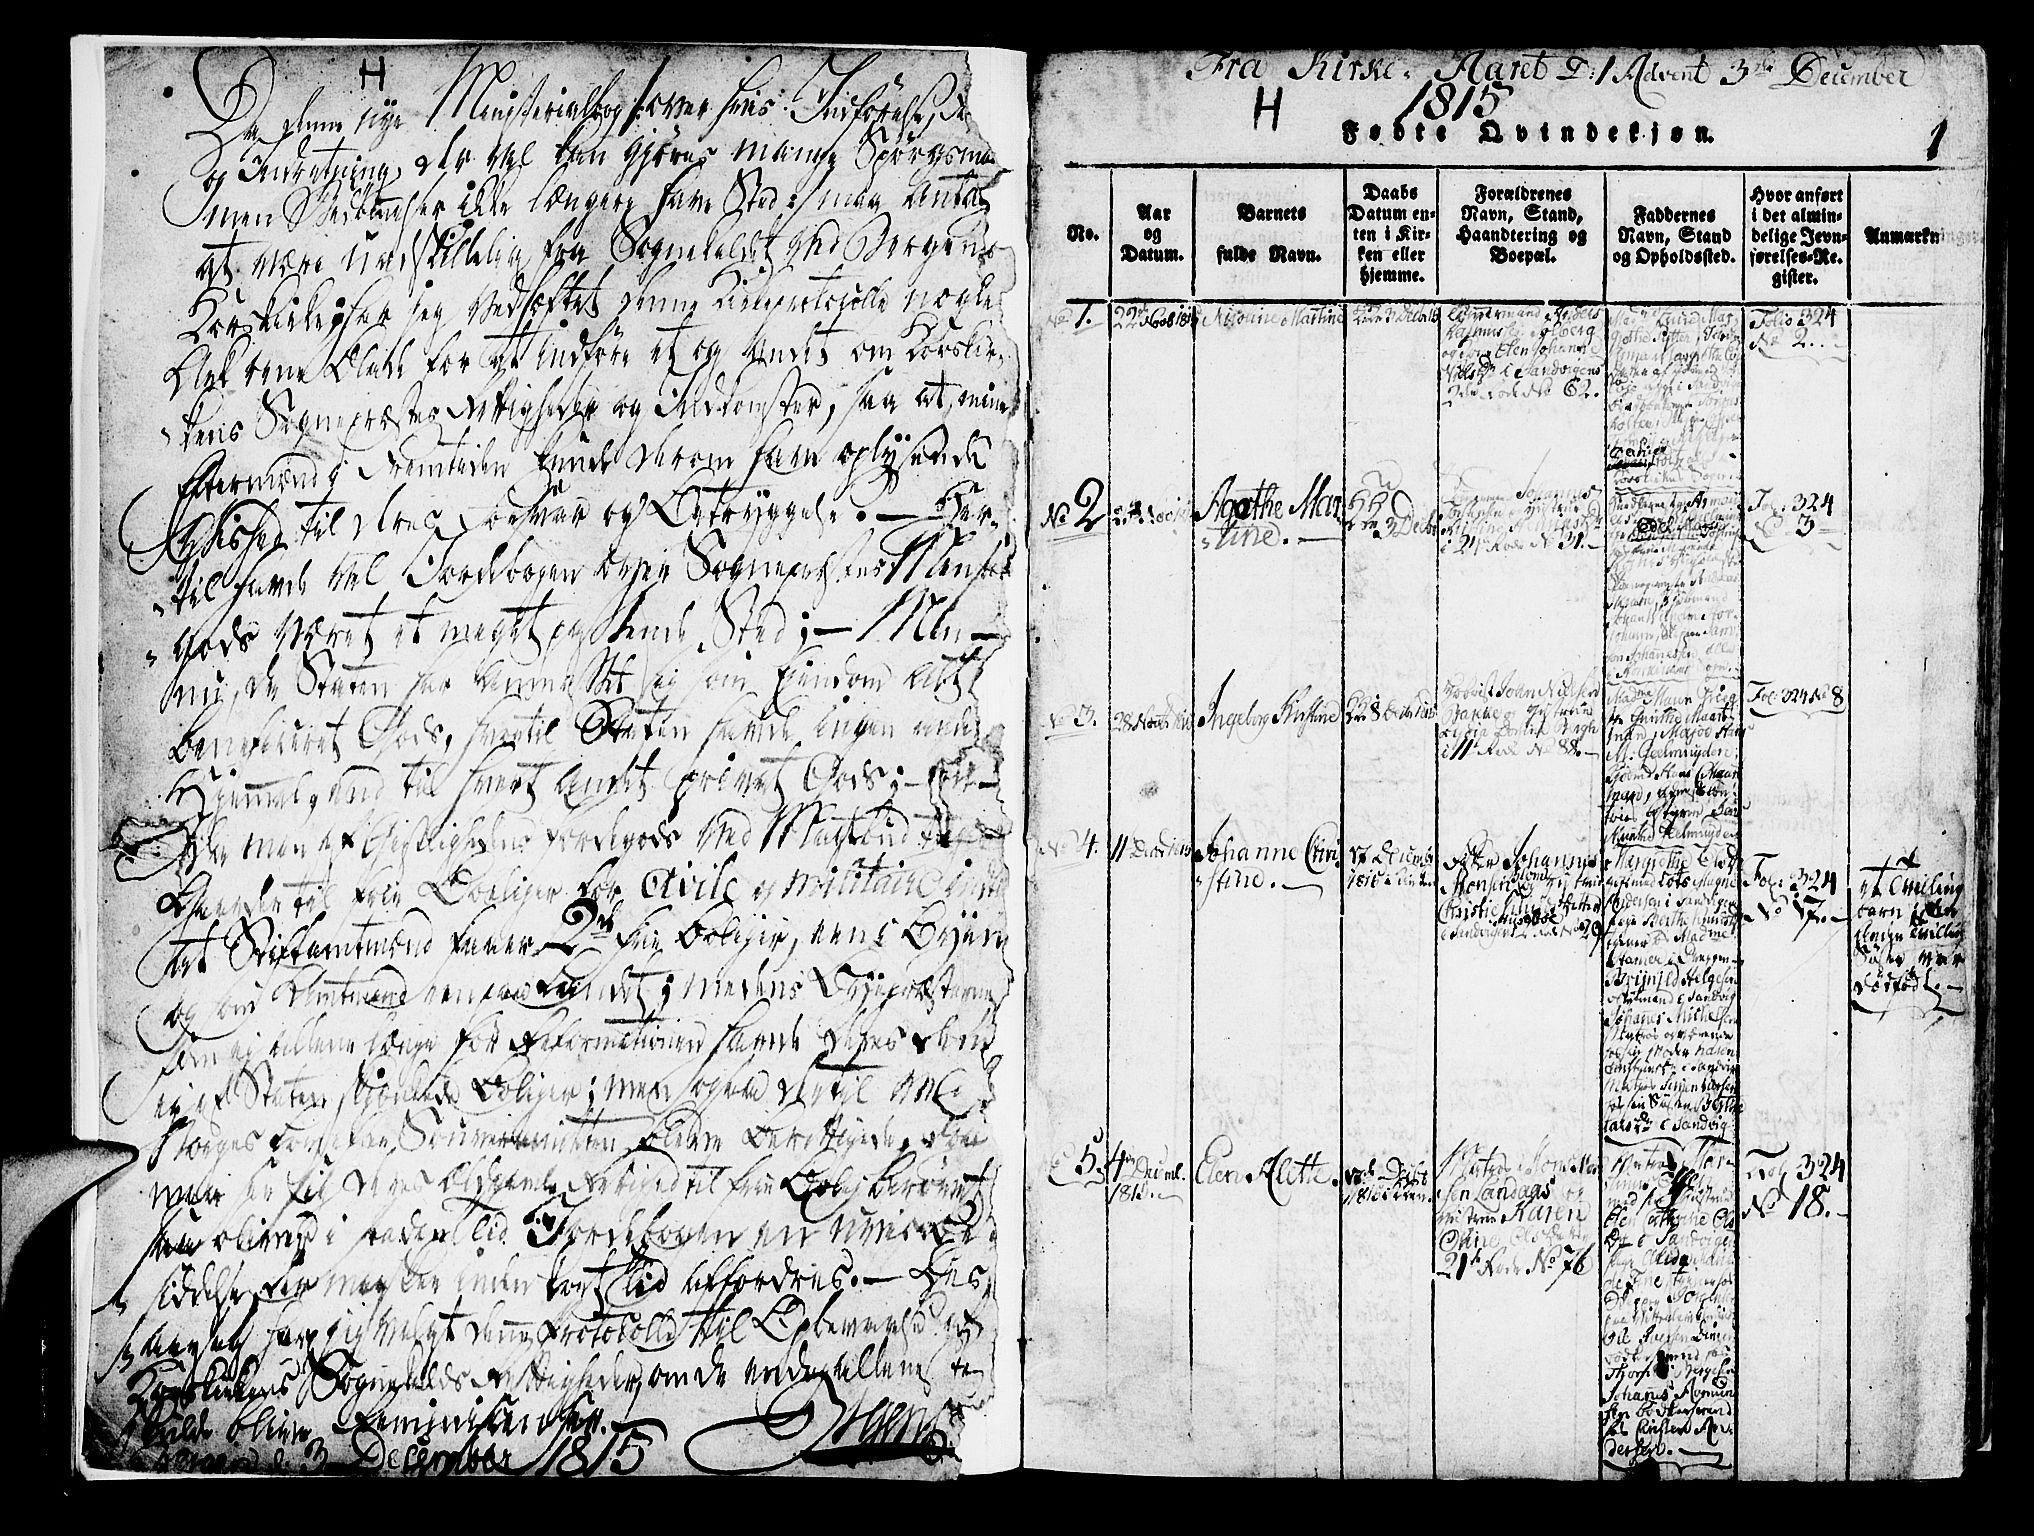 SAB, Korskirken Sokneprestembete, H/Haa/L0013: Ministerialbok nr. A 13, 1815-1822, s. 1